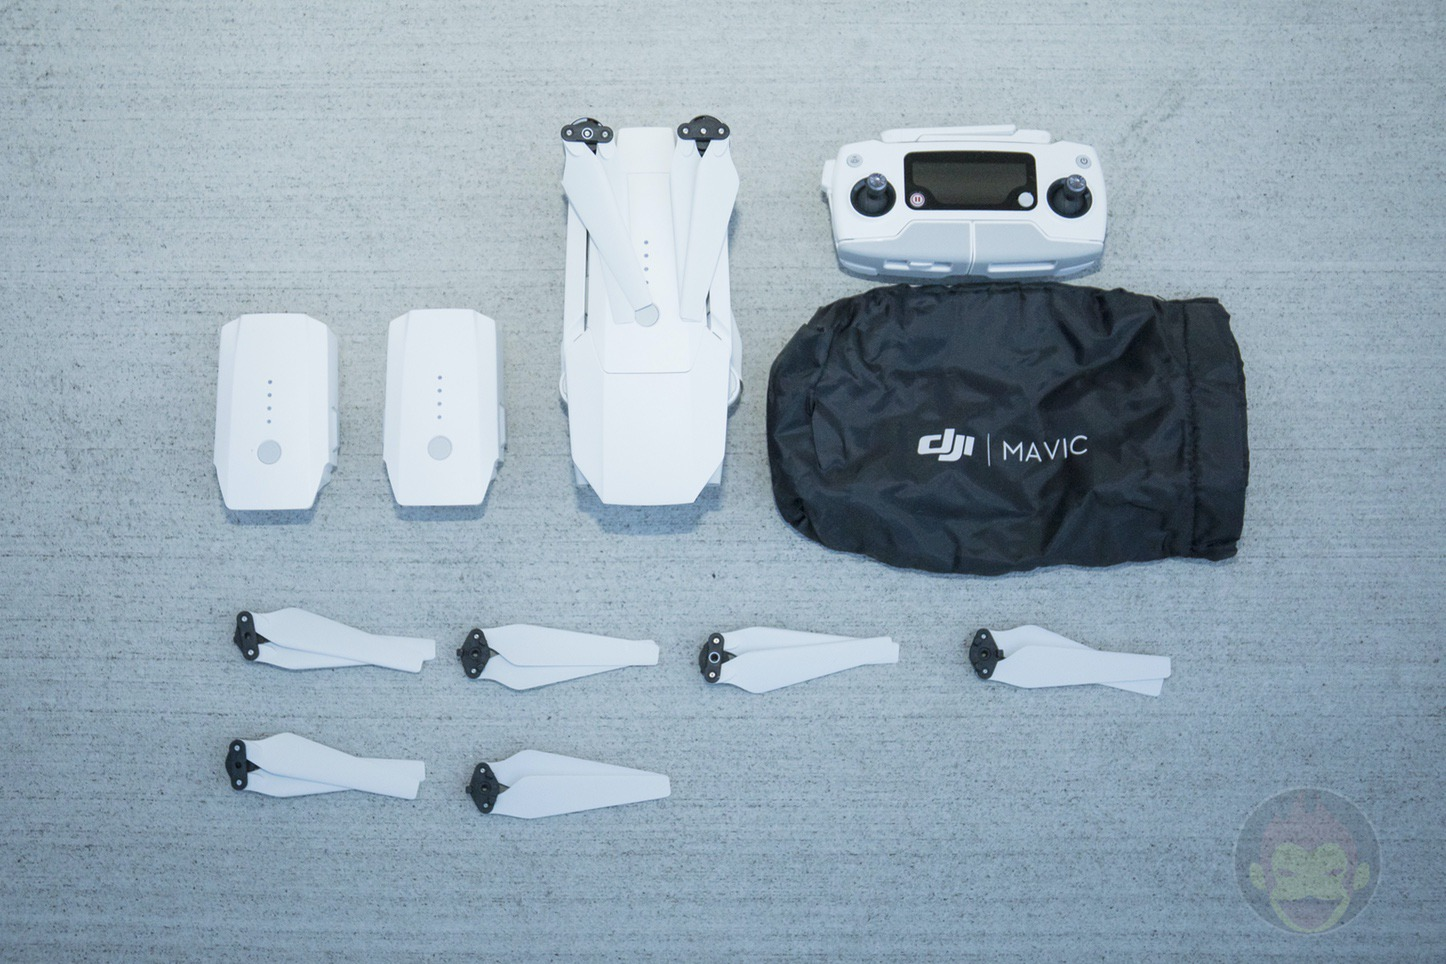 DJI Mavic Pro Alpine White 14